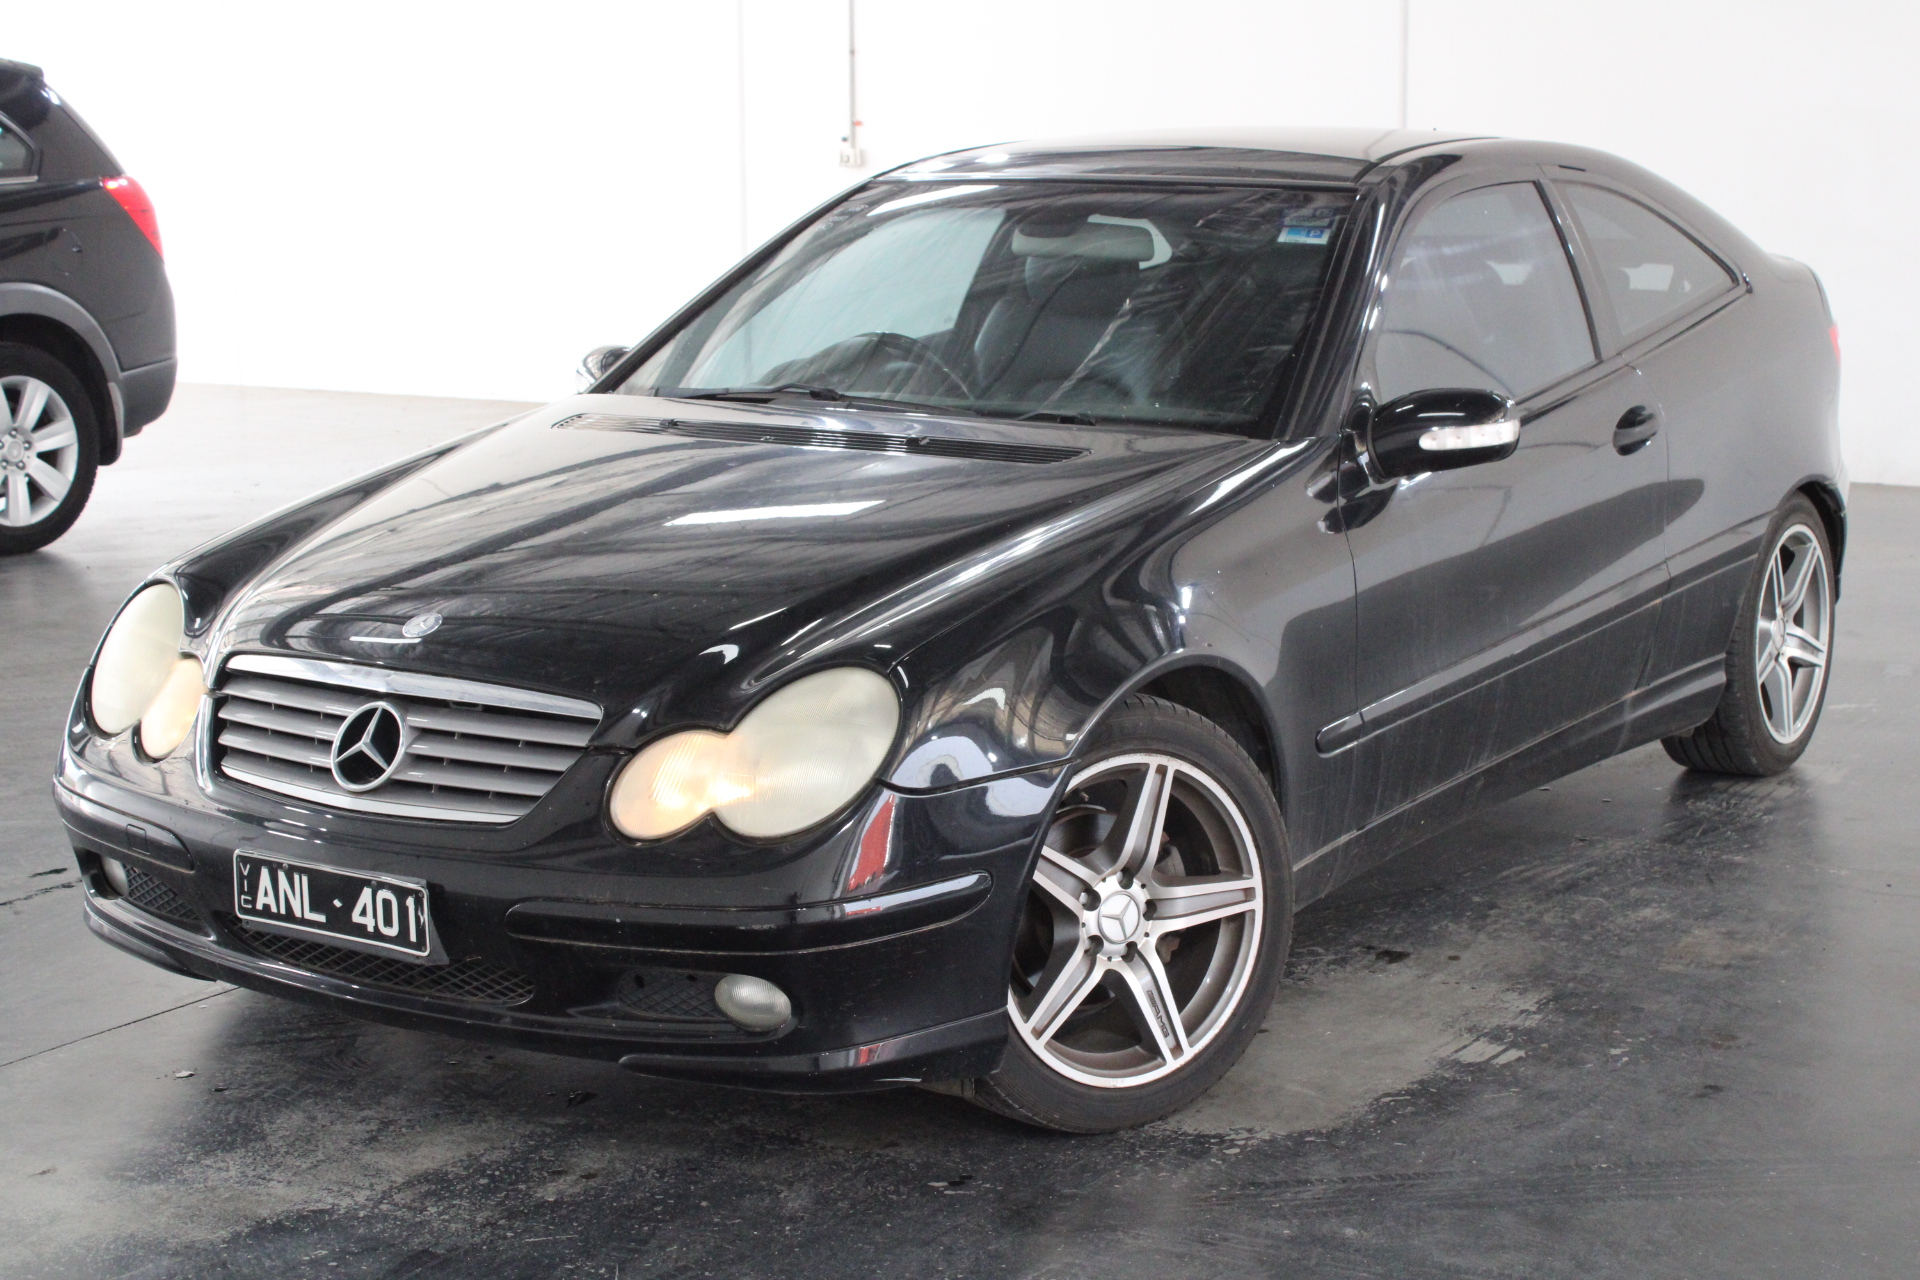 2001 Mercedes Benz C200 Kompressor CL203 Automatic Coupe